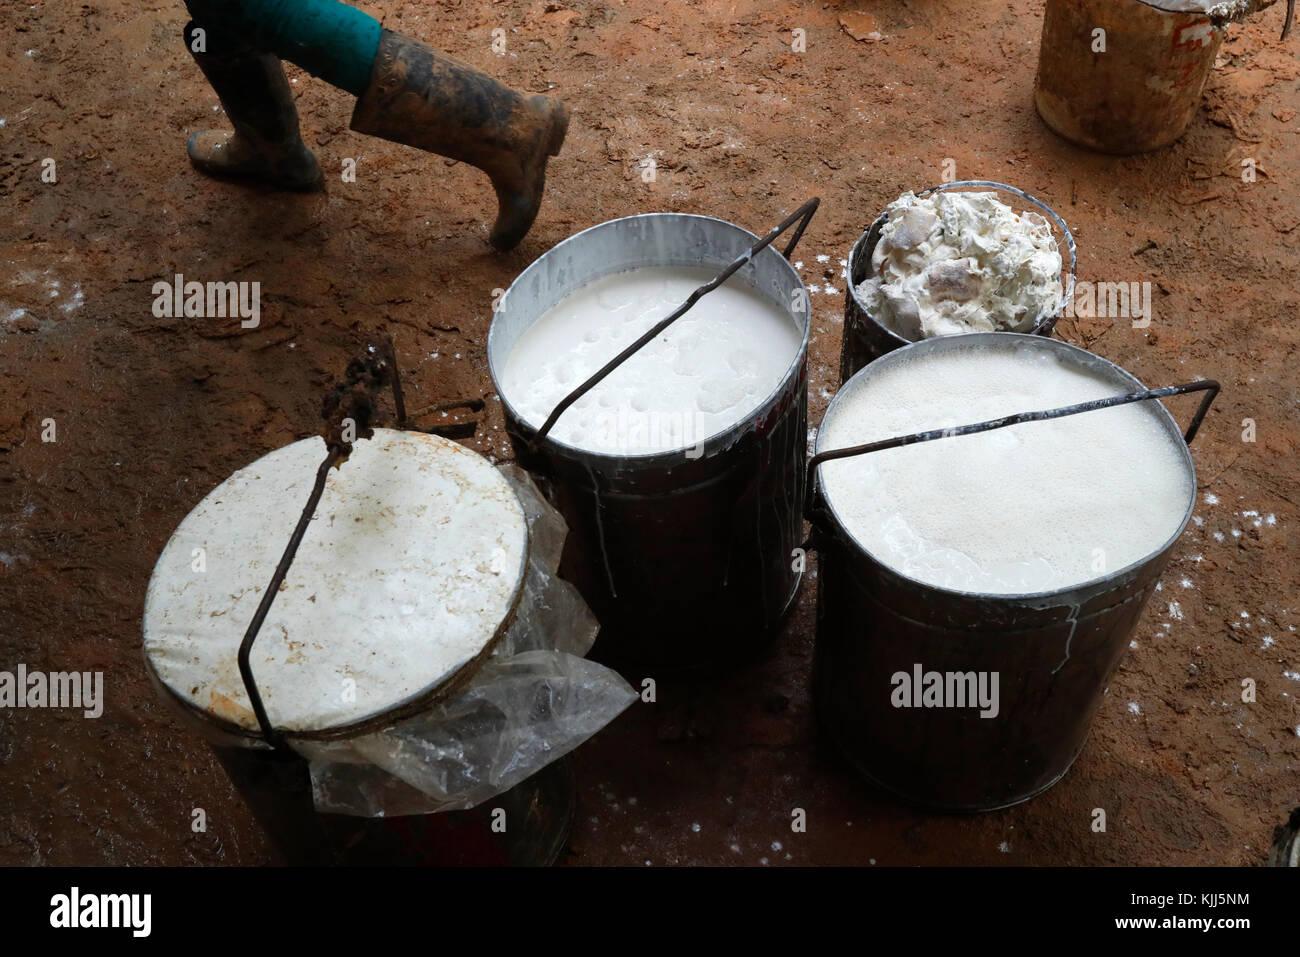 Gummibaum Latex und Gummi. Kon Tum. Vietnam. Stockbild